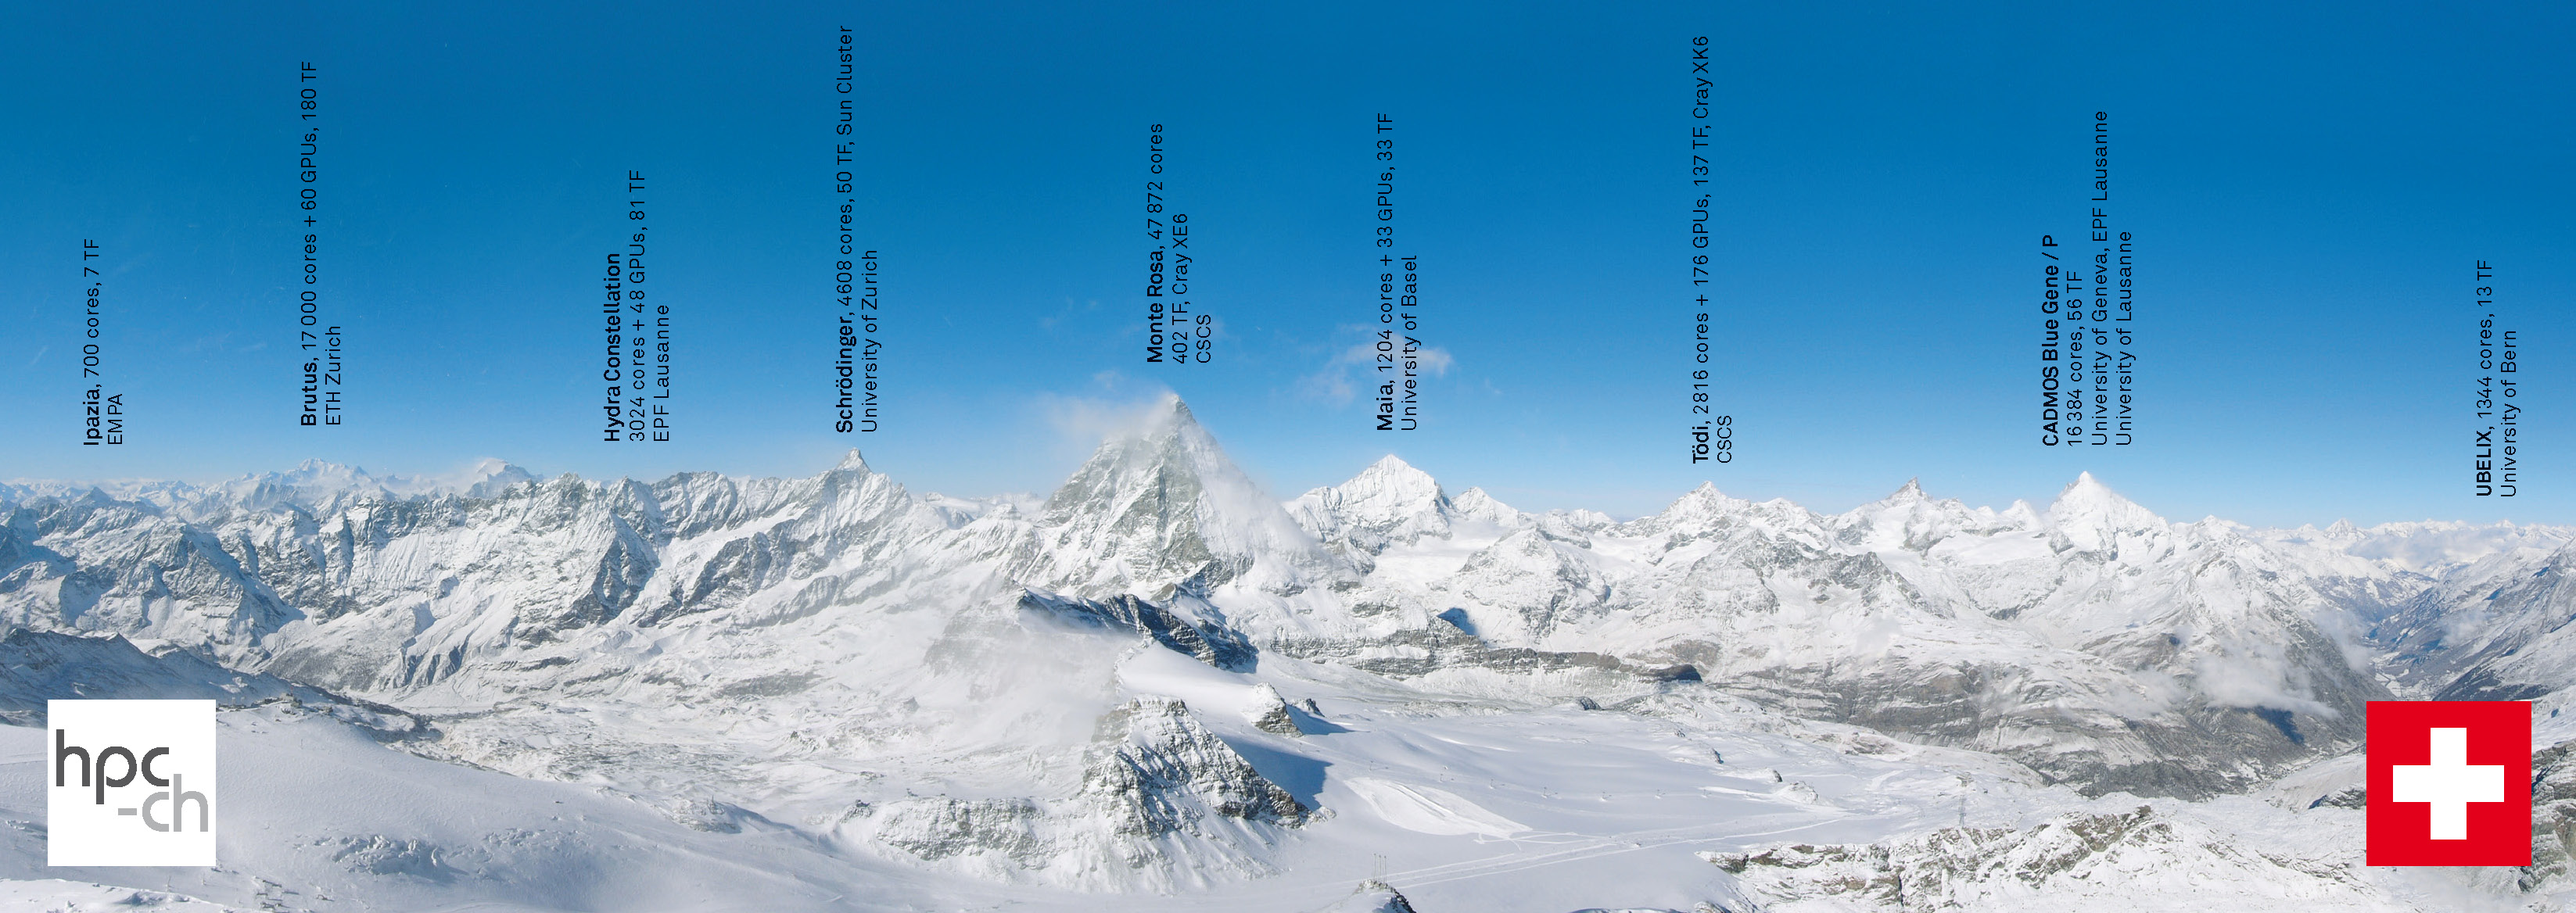 hpc-ch Swiss Alps Panorama